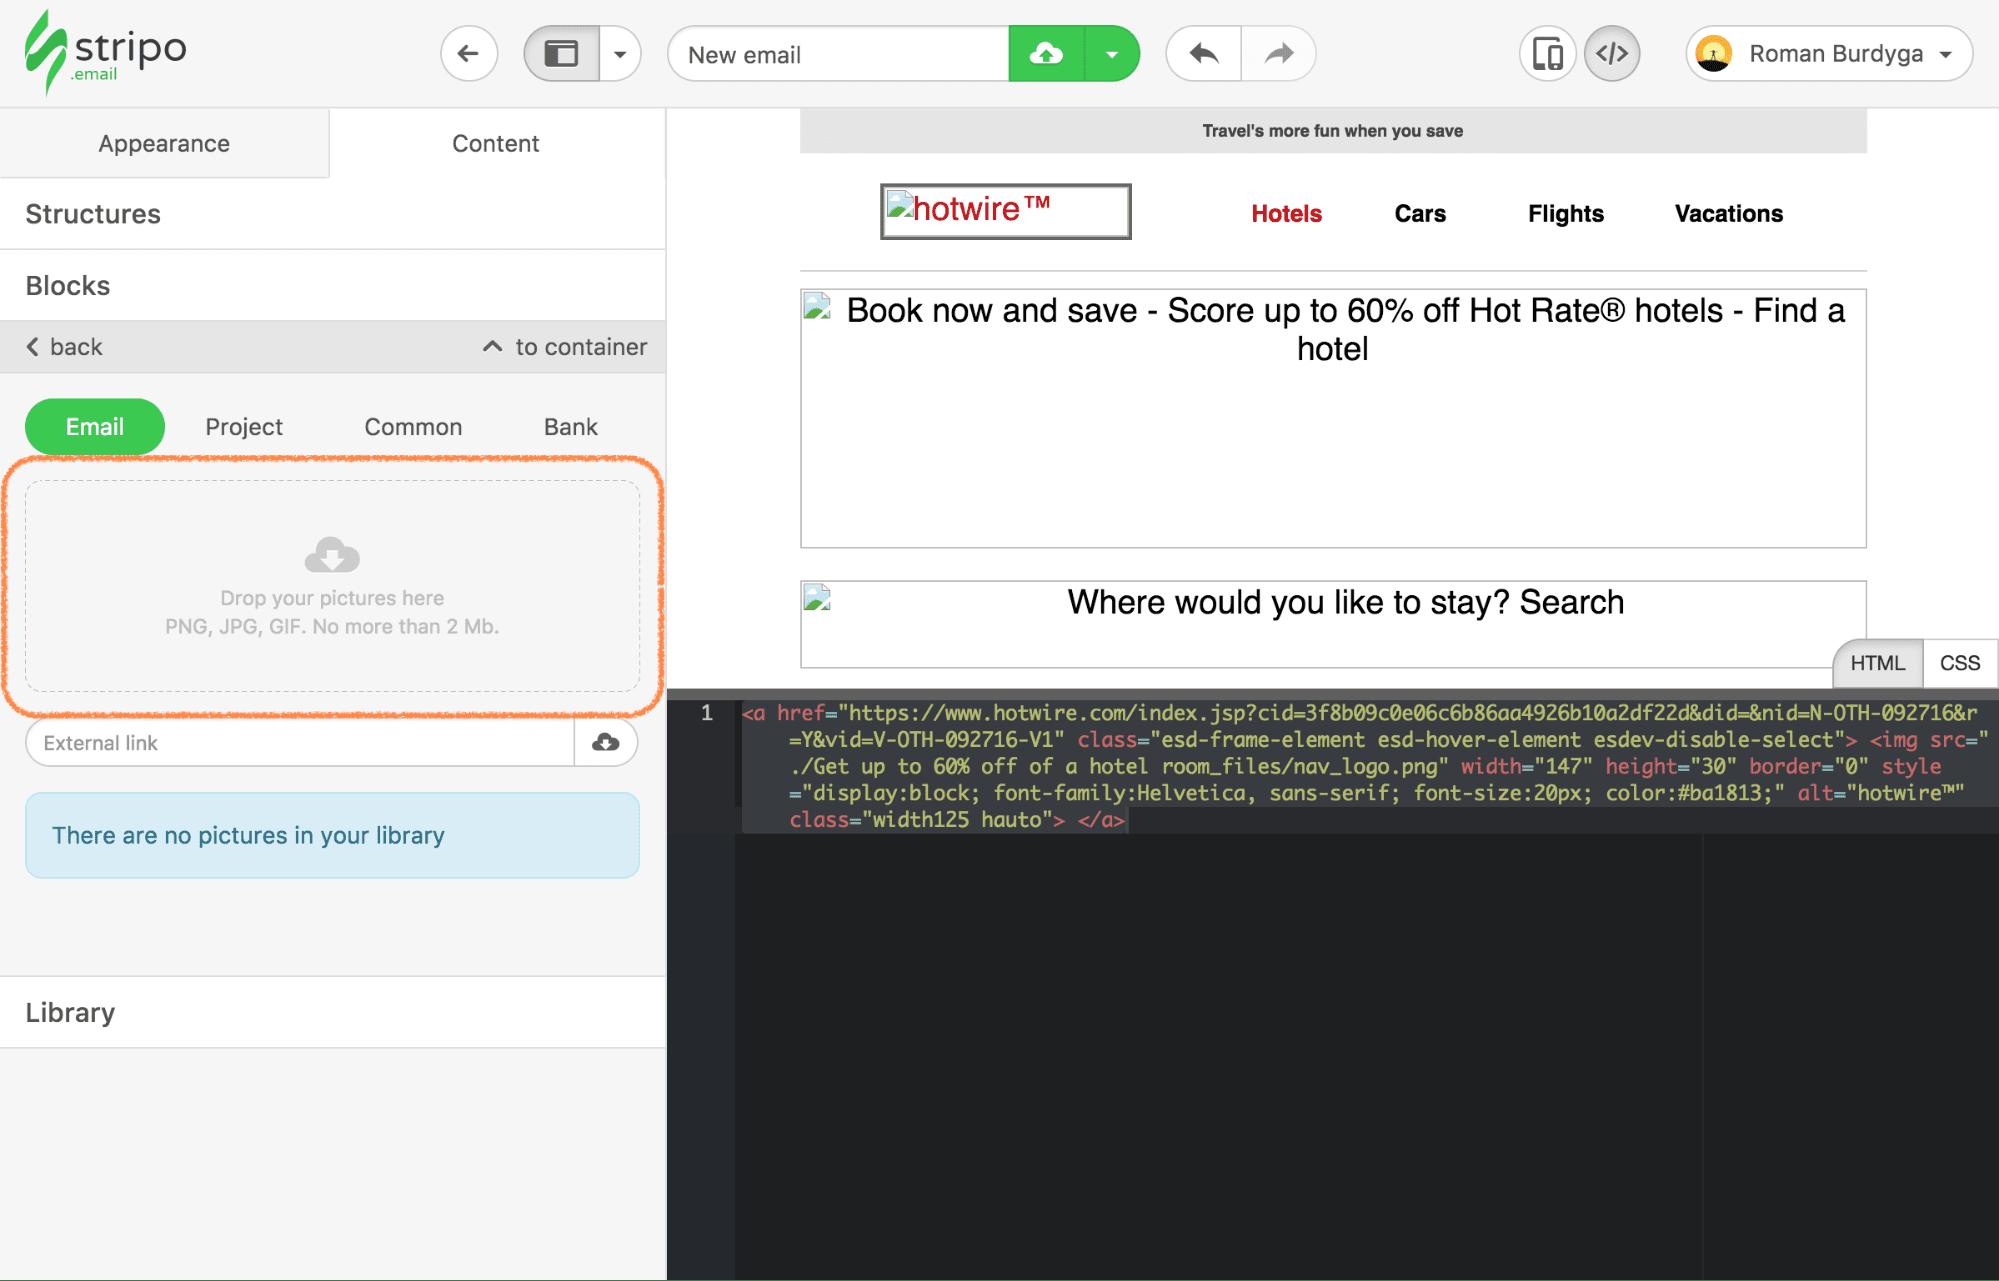 Adaptation of the Custom HTML in Stripo